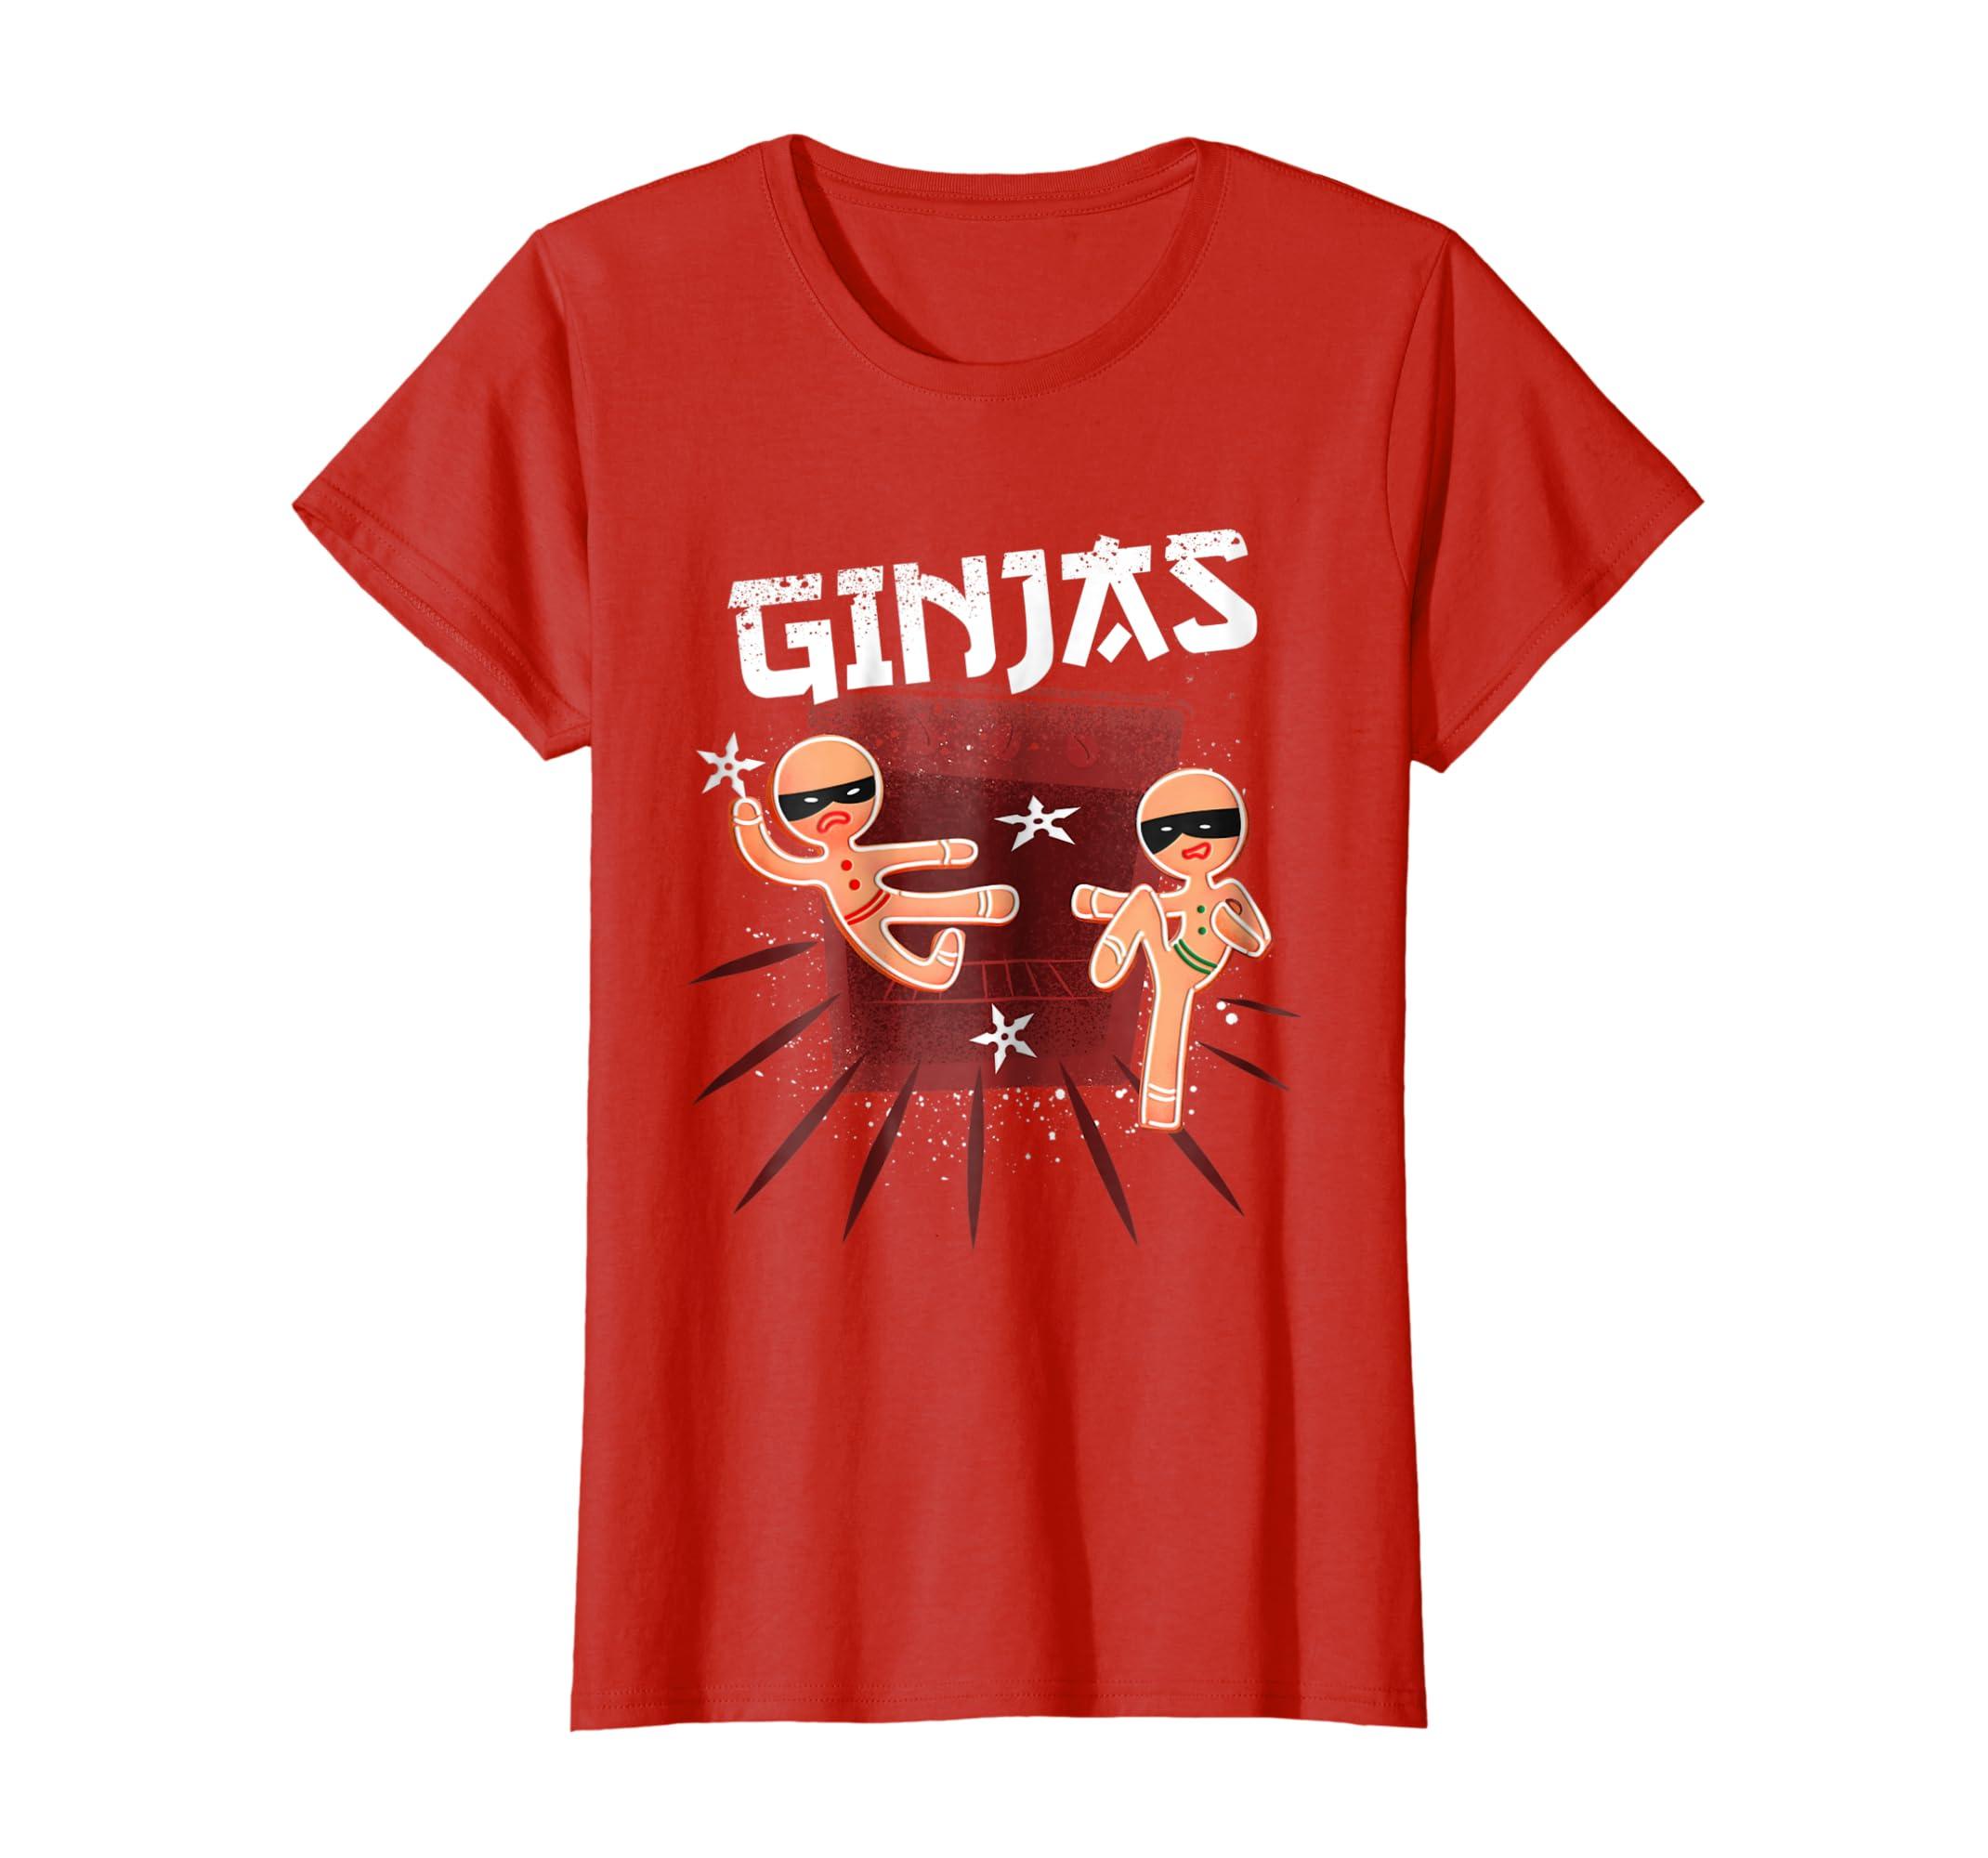 Amazon.com: Ginja Ninja Decoration T-shirt Costume for ...